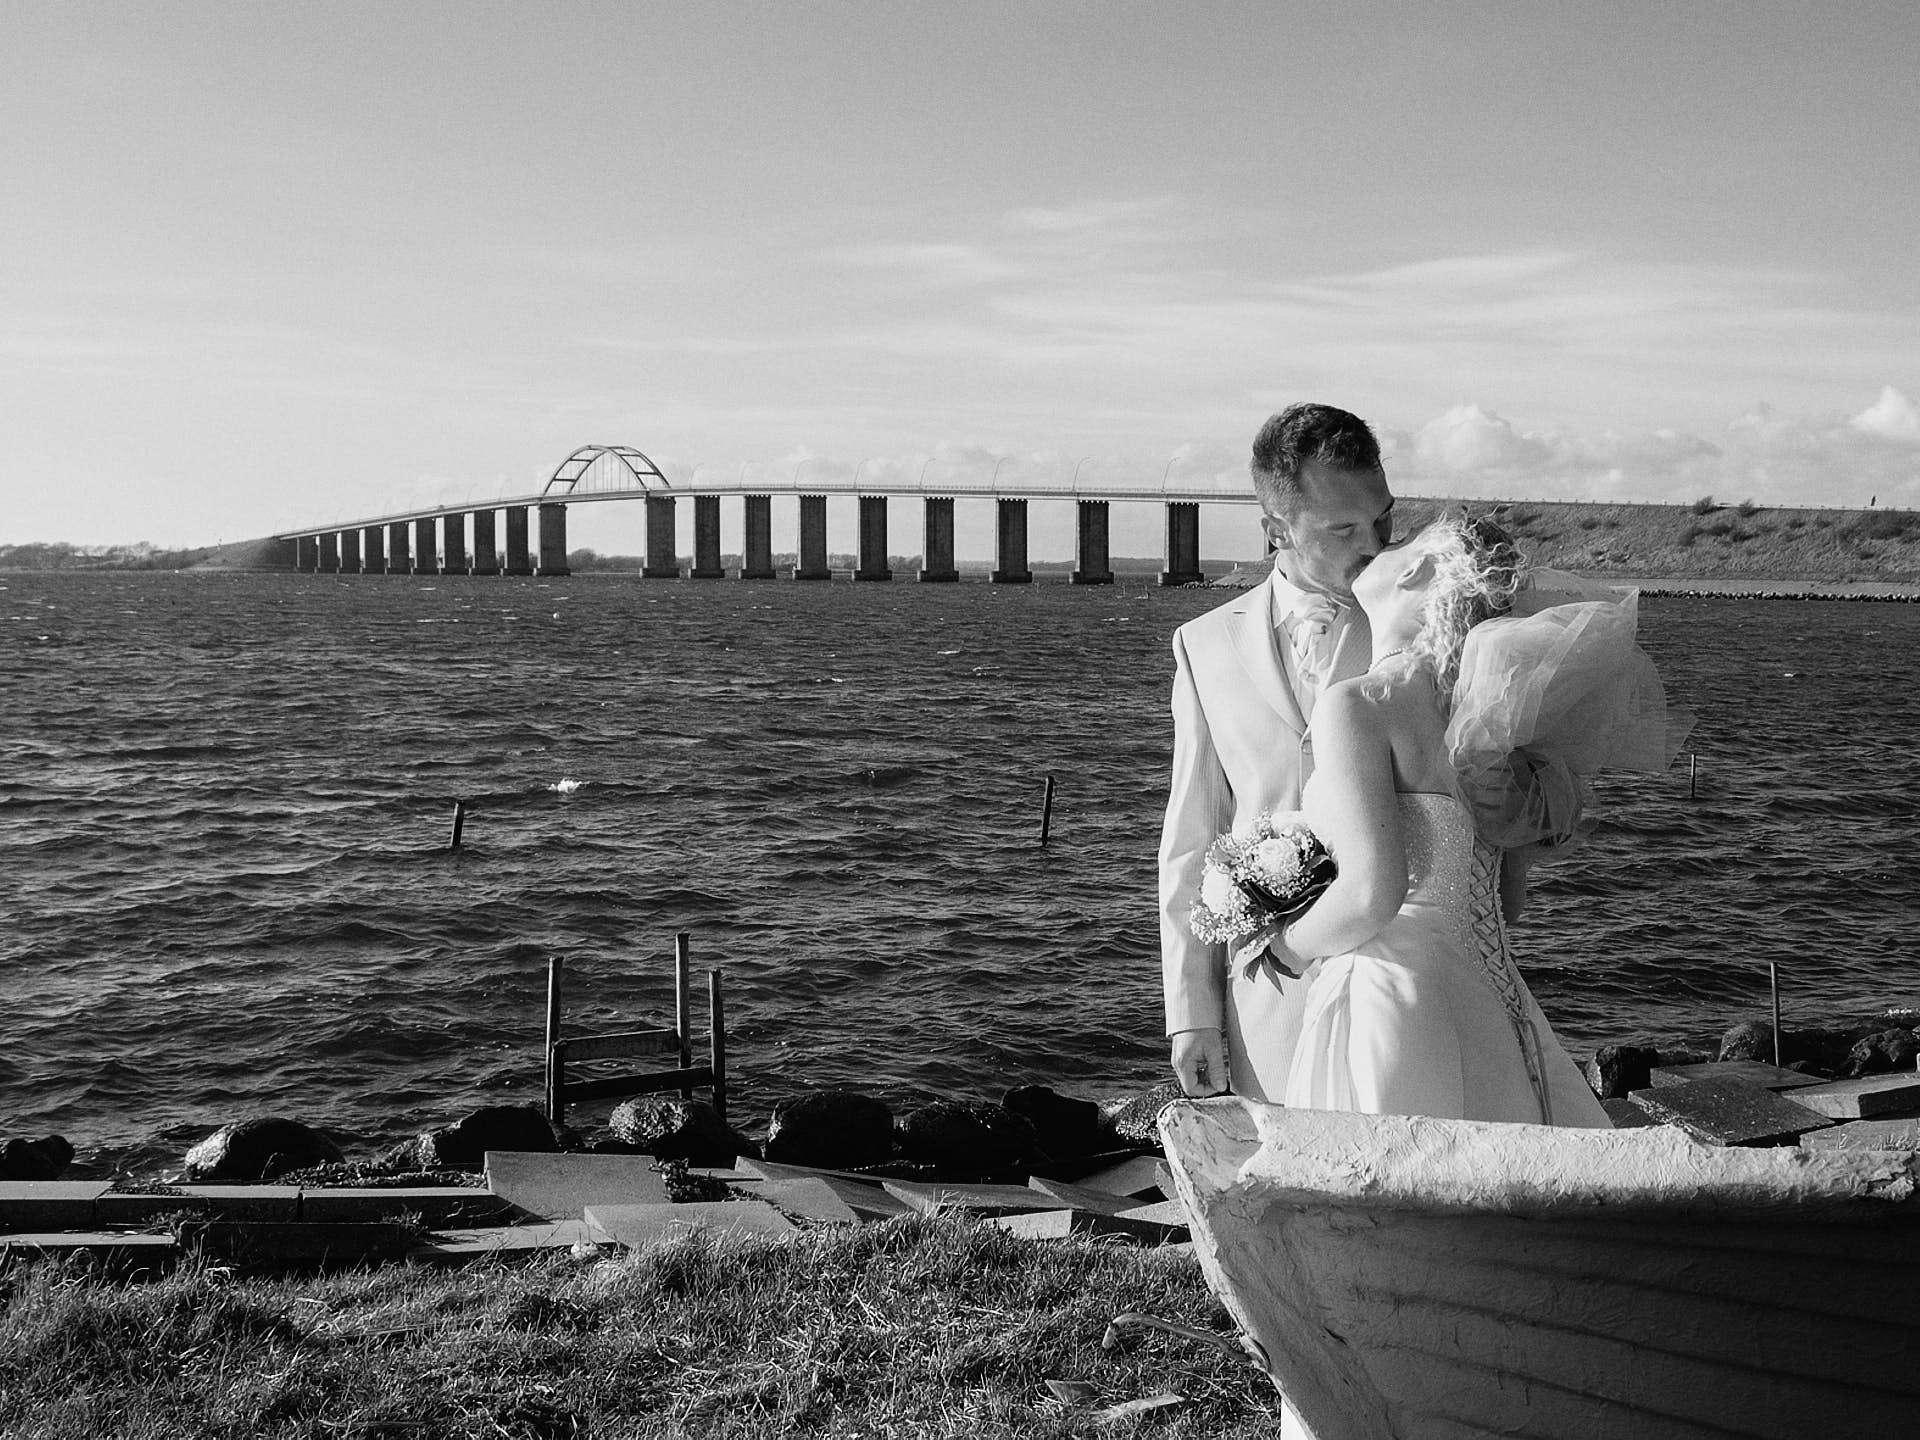 bryllupsfotografen på arbejde sol